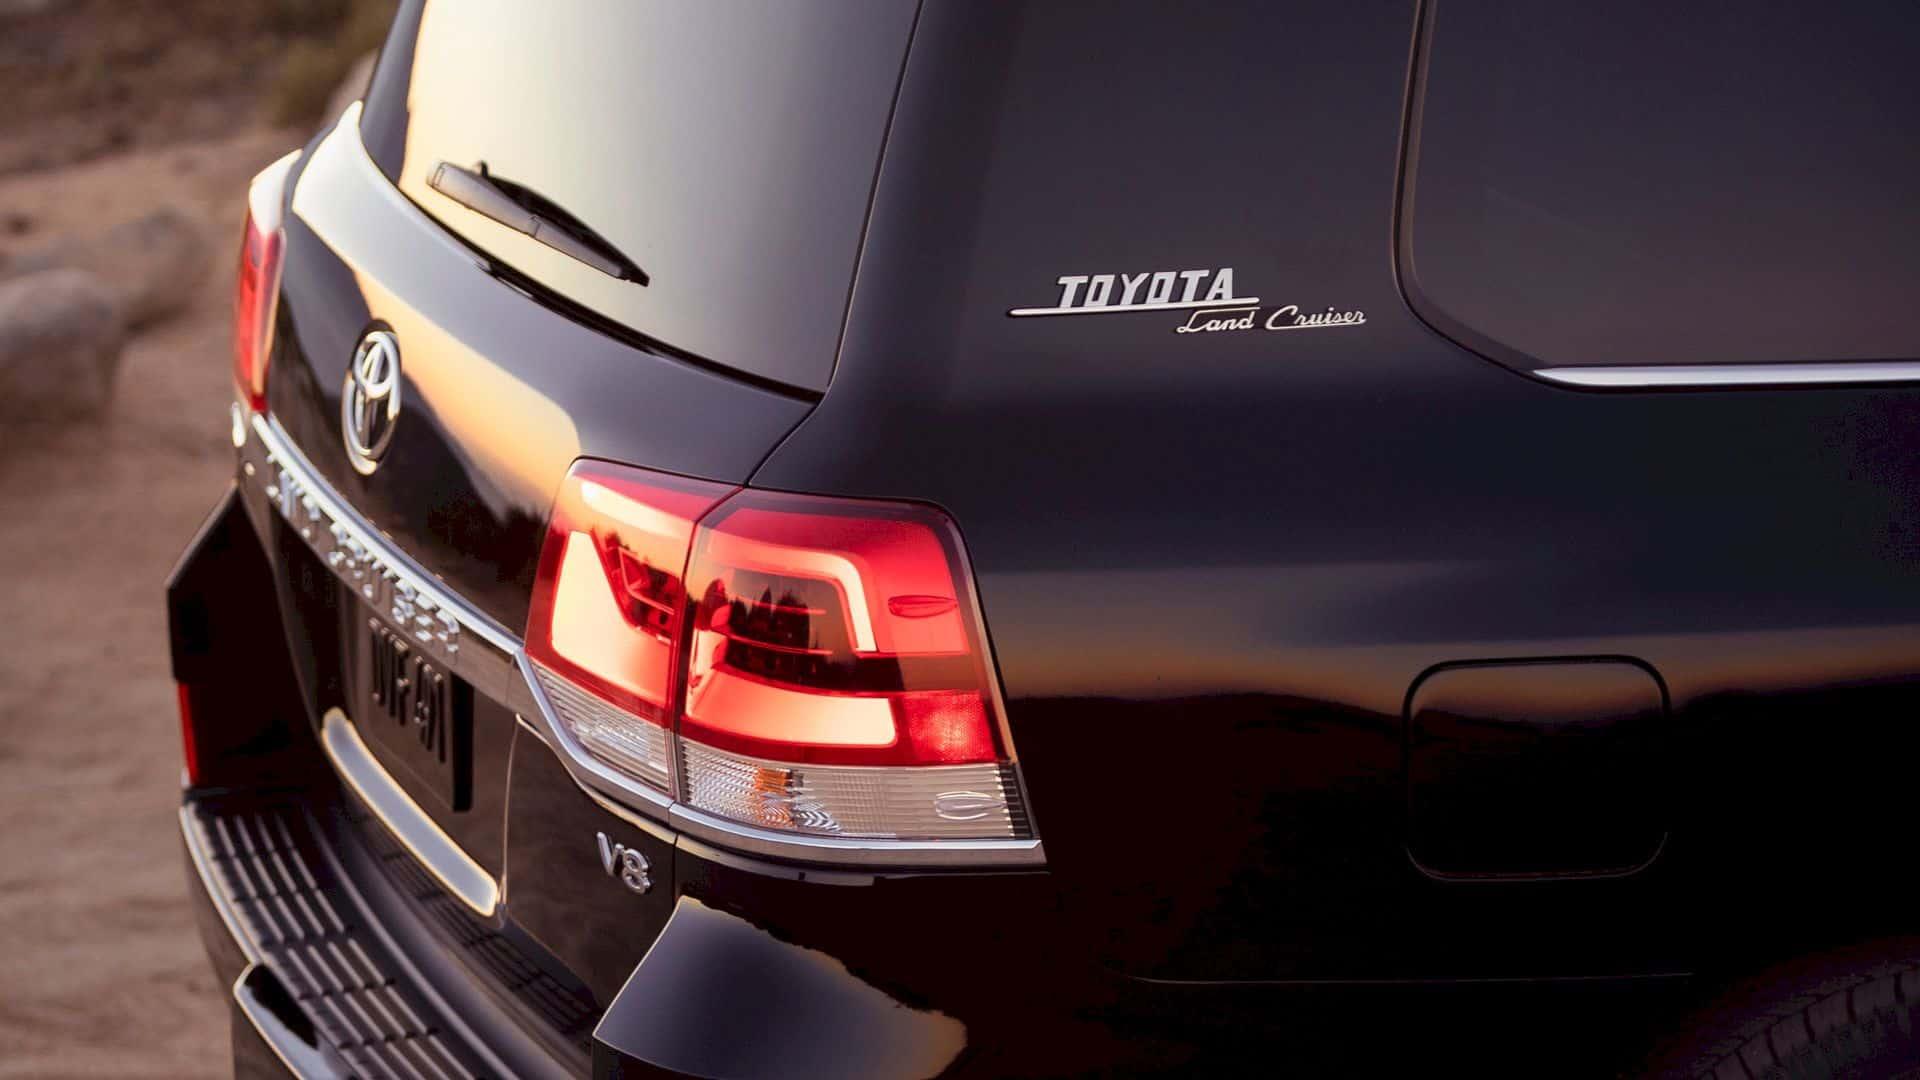 2020 Toyota Land Cruiser 5